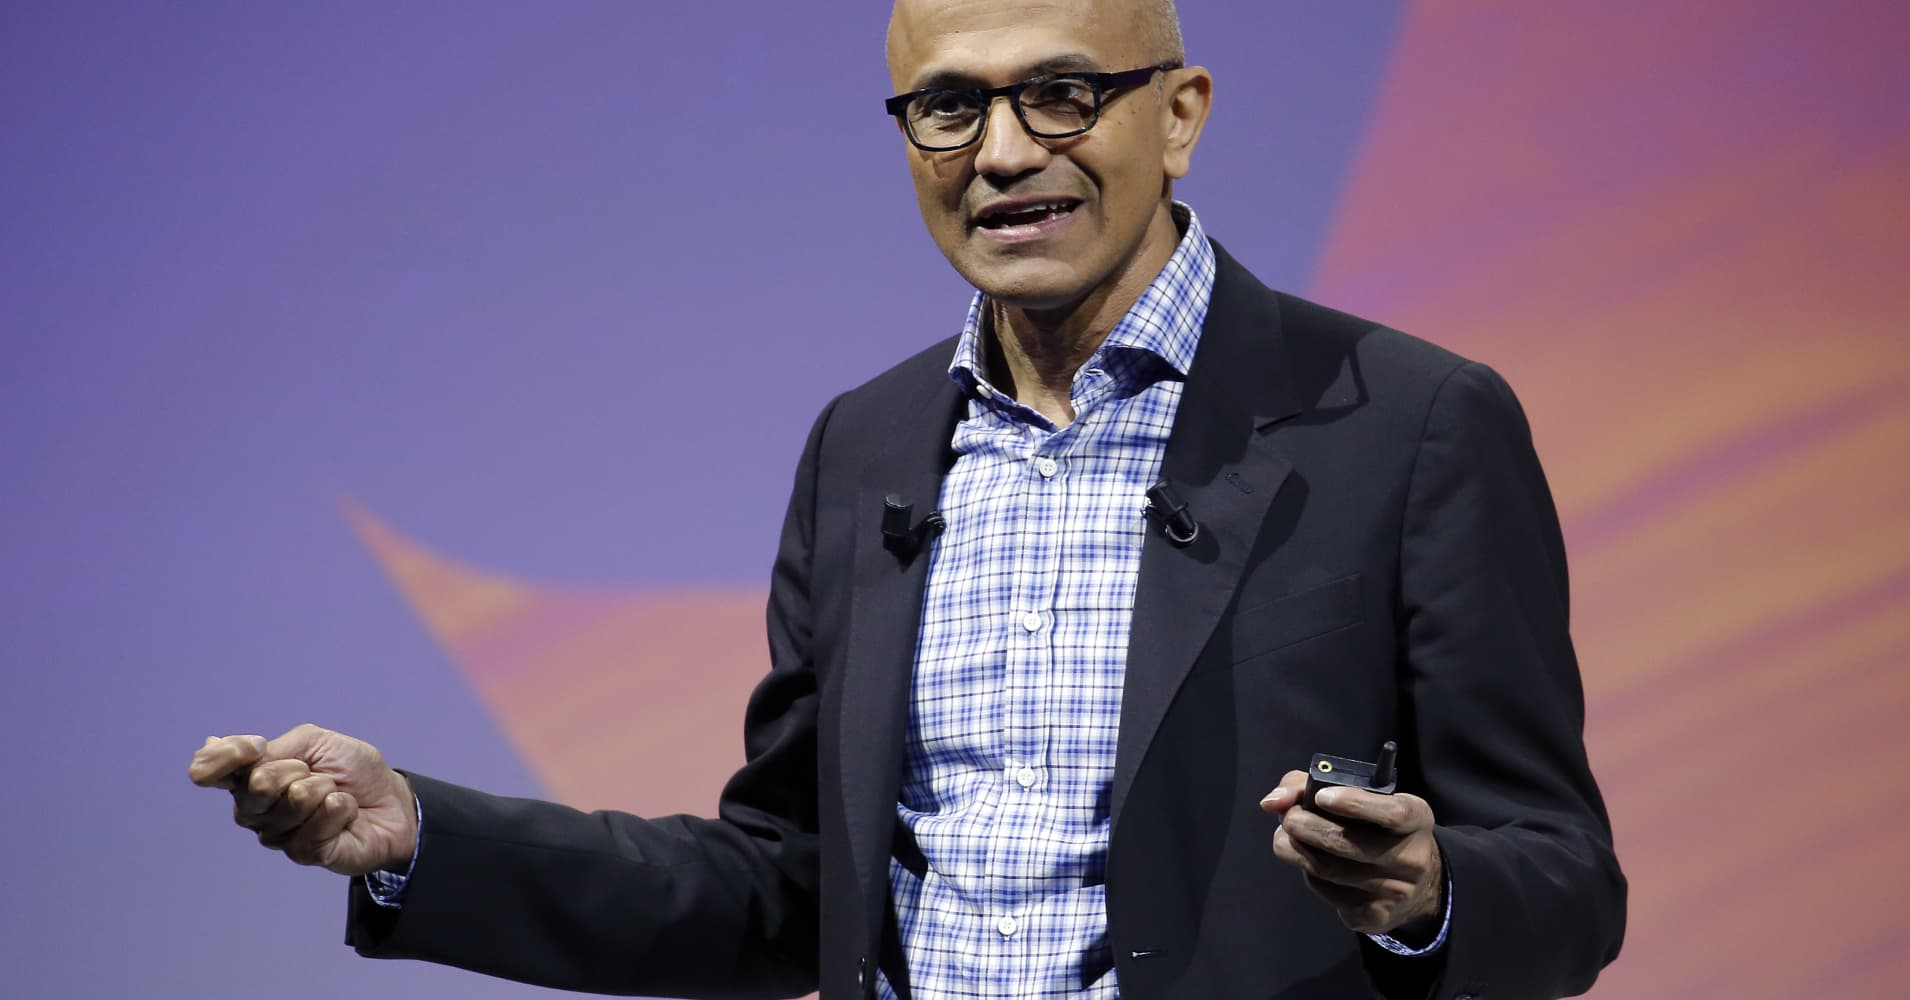 Microsoft hits $1 trillion market cap after earnings beat estimates